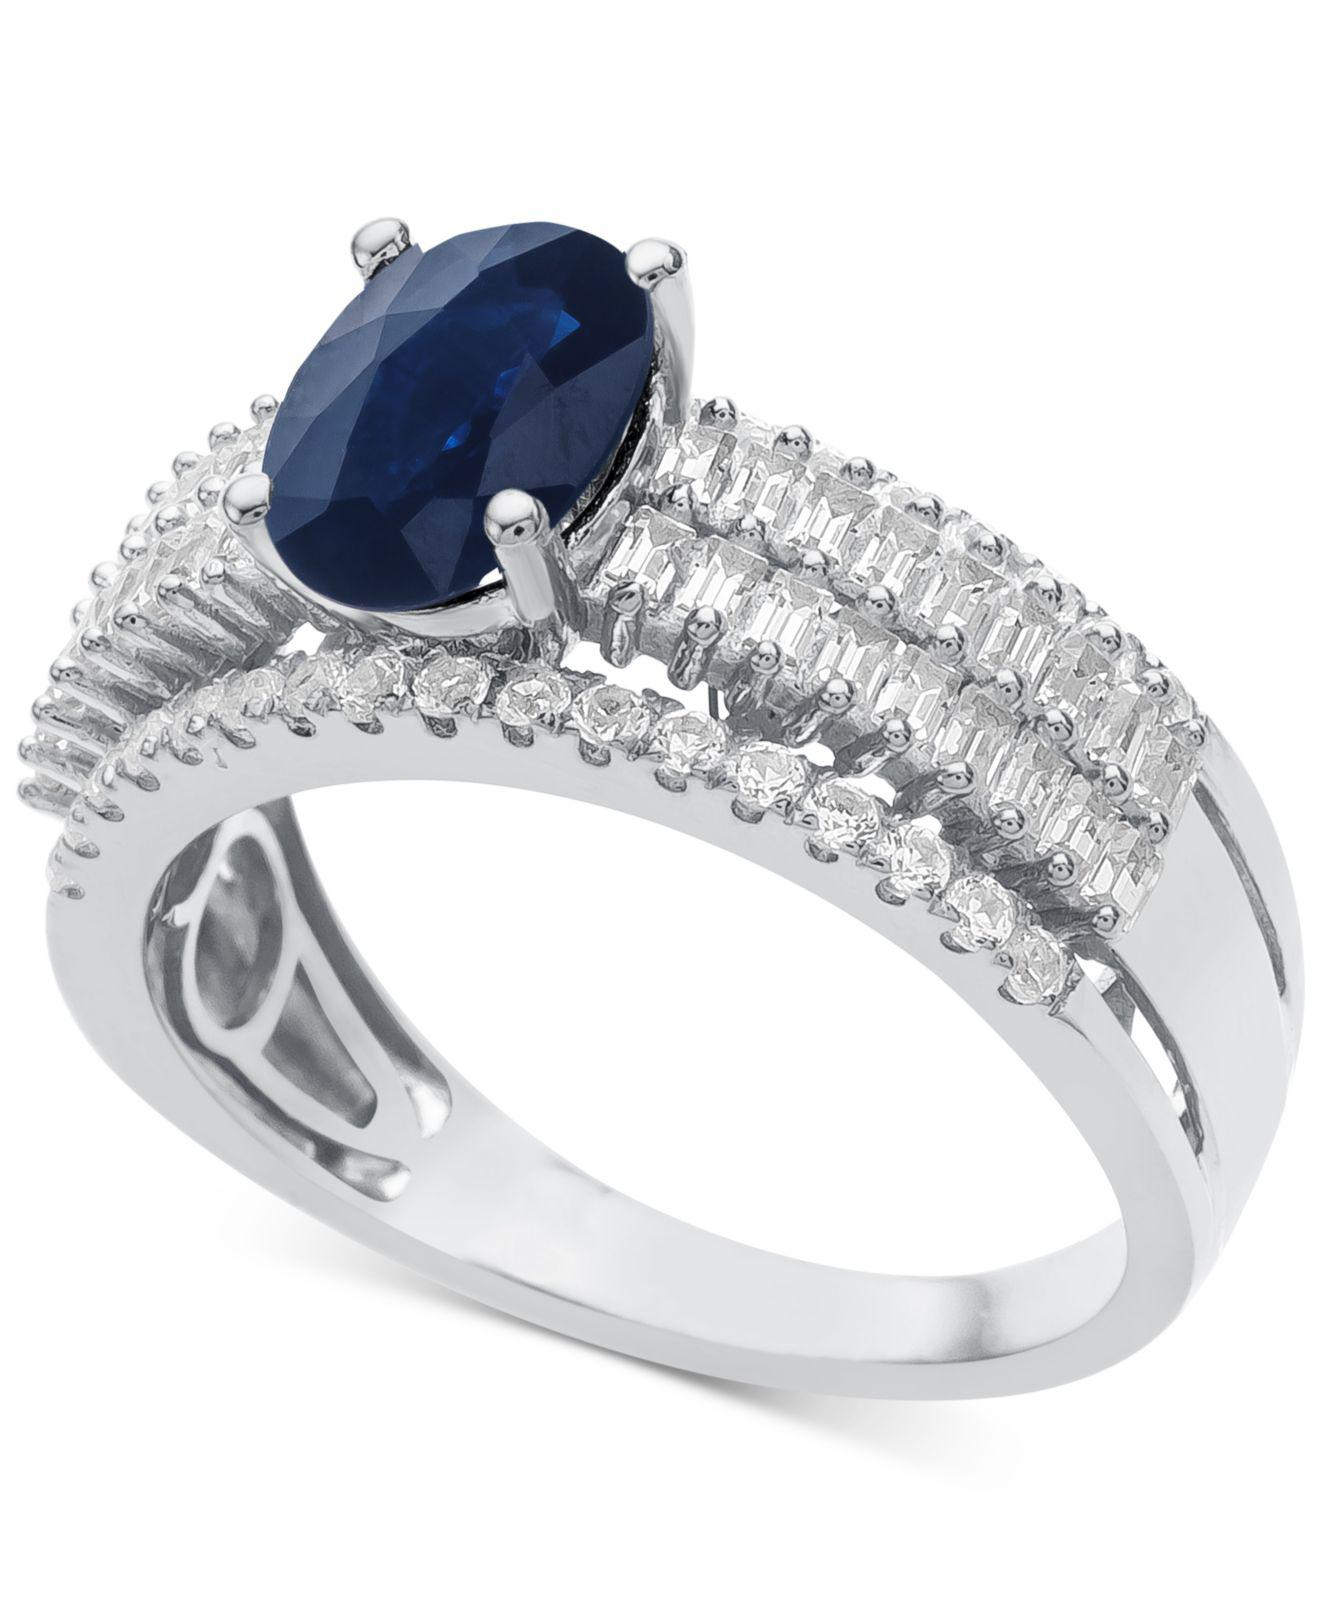 66562645a Lyst - Macy's Sapphire (1-1/3 Ct. T.w.) & Diamond (5/8 Ct. T.w. ...